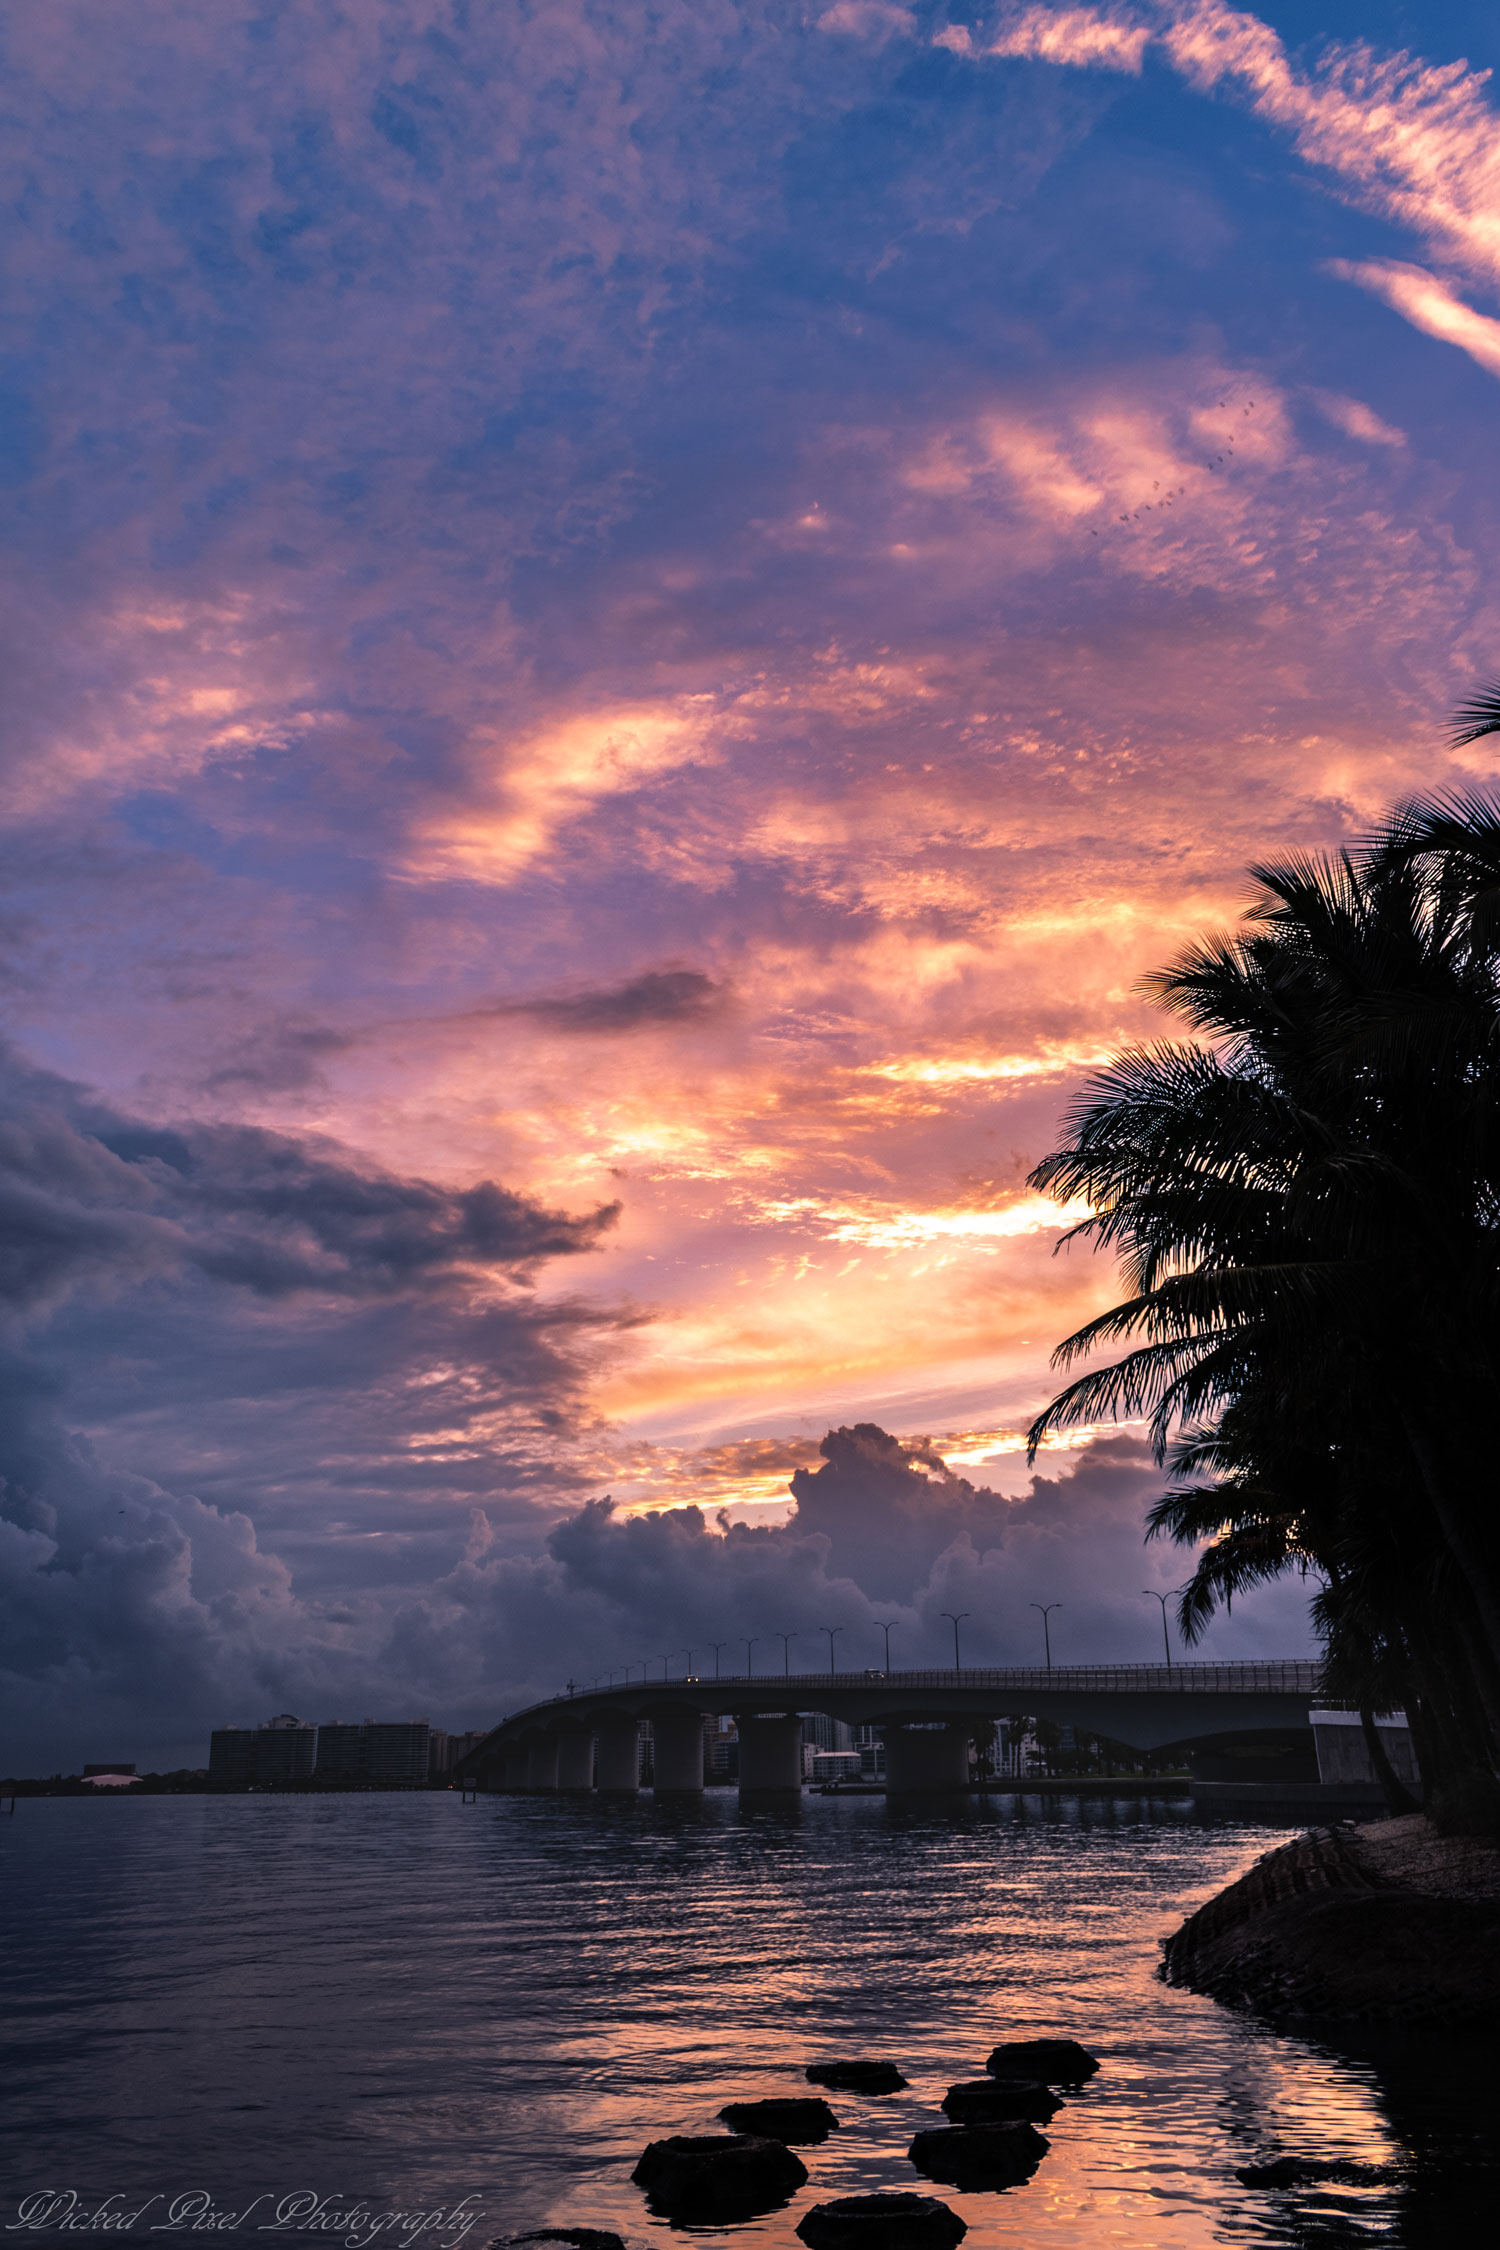 John-ringling-Bridge-Pink-Sunrise-Storm-Clouds.jpg